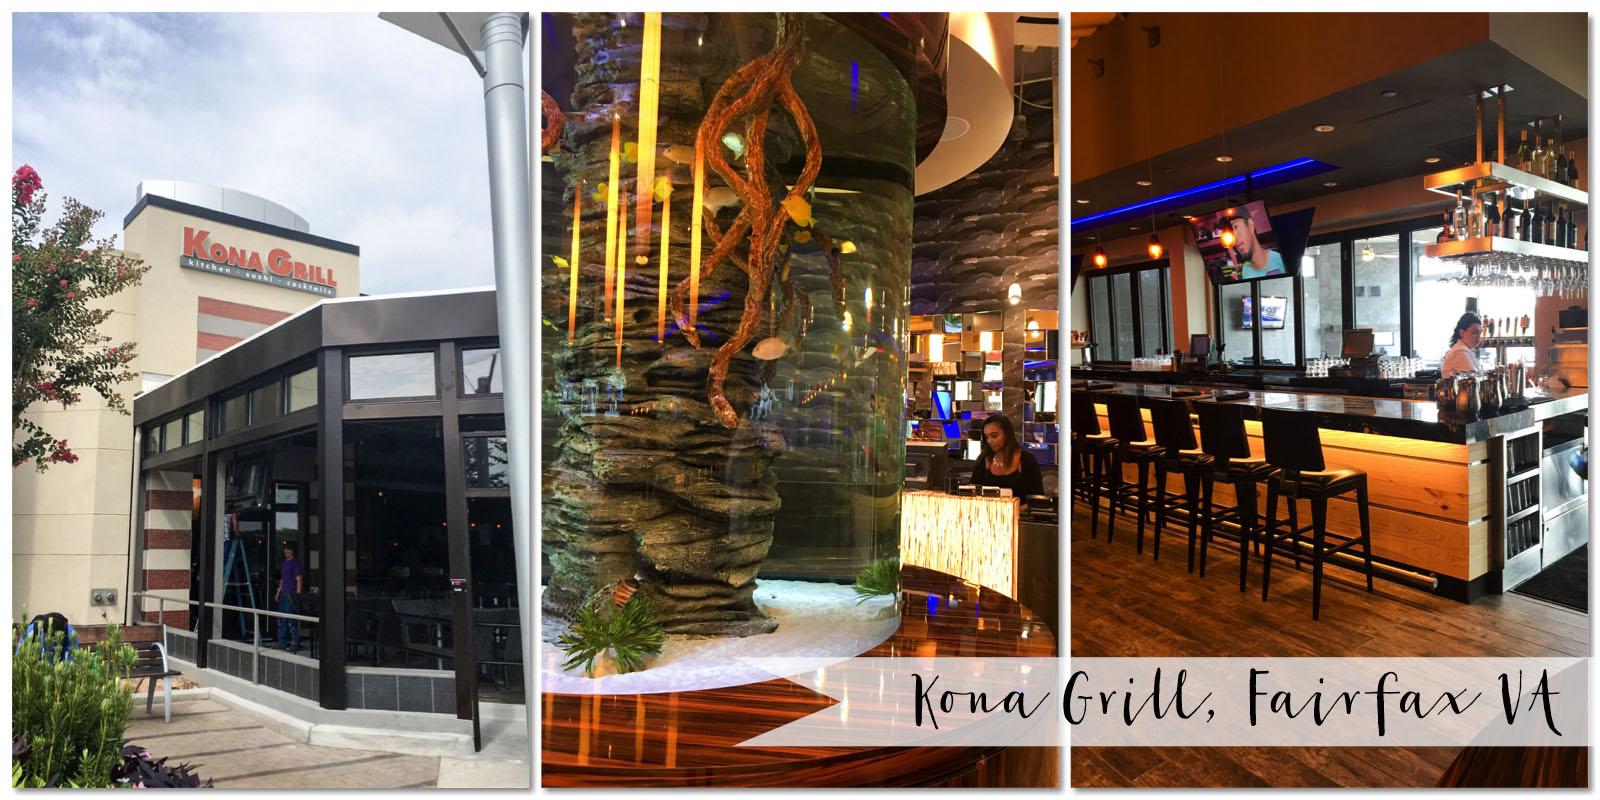 Restaurants Fairfax Va Kona Grill Review Fair Oaks Mall